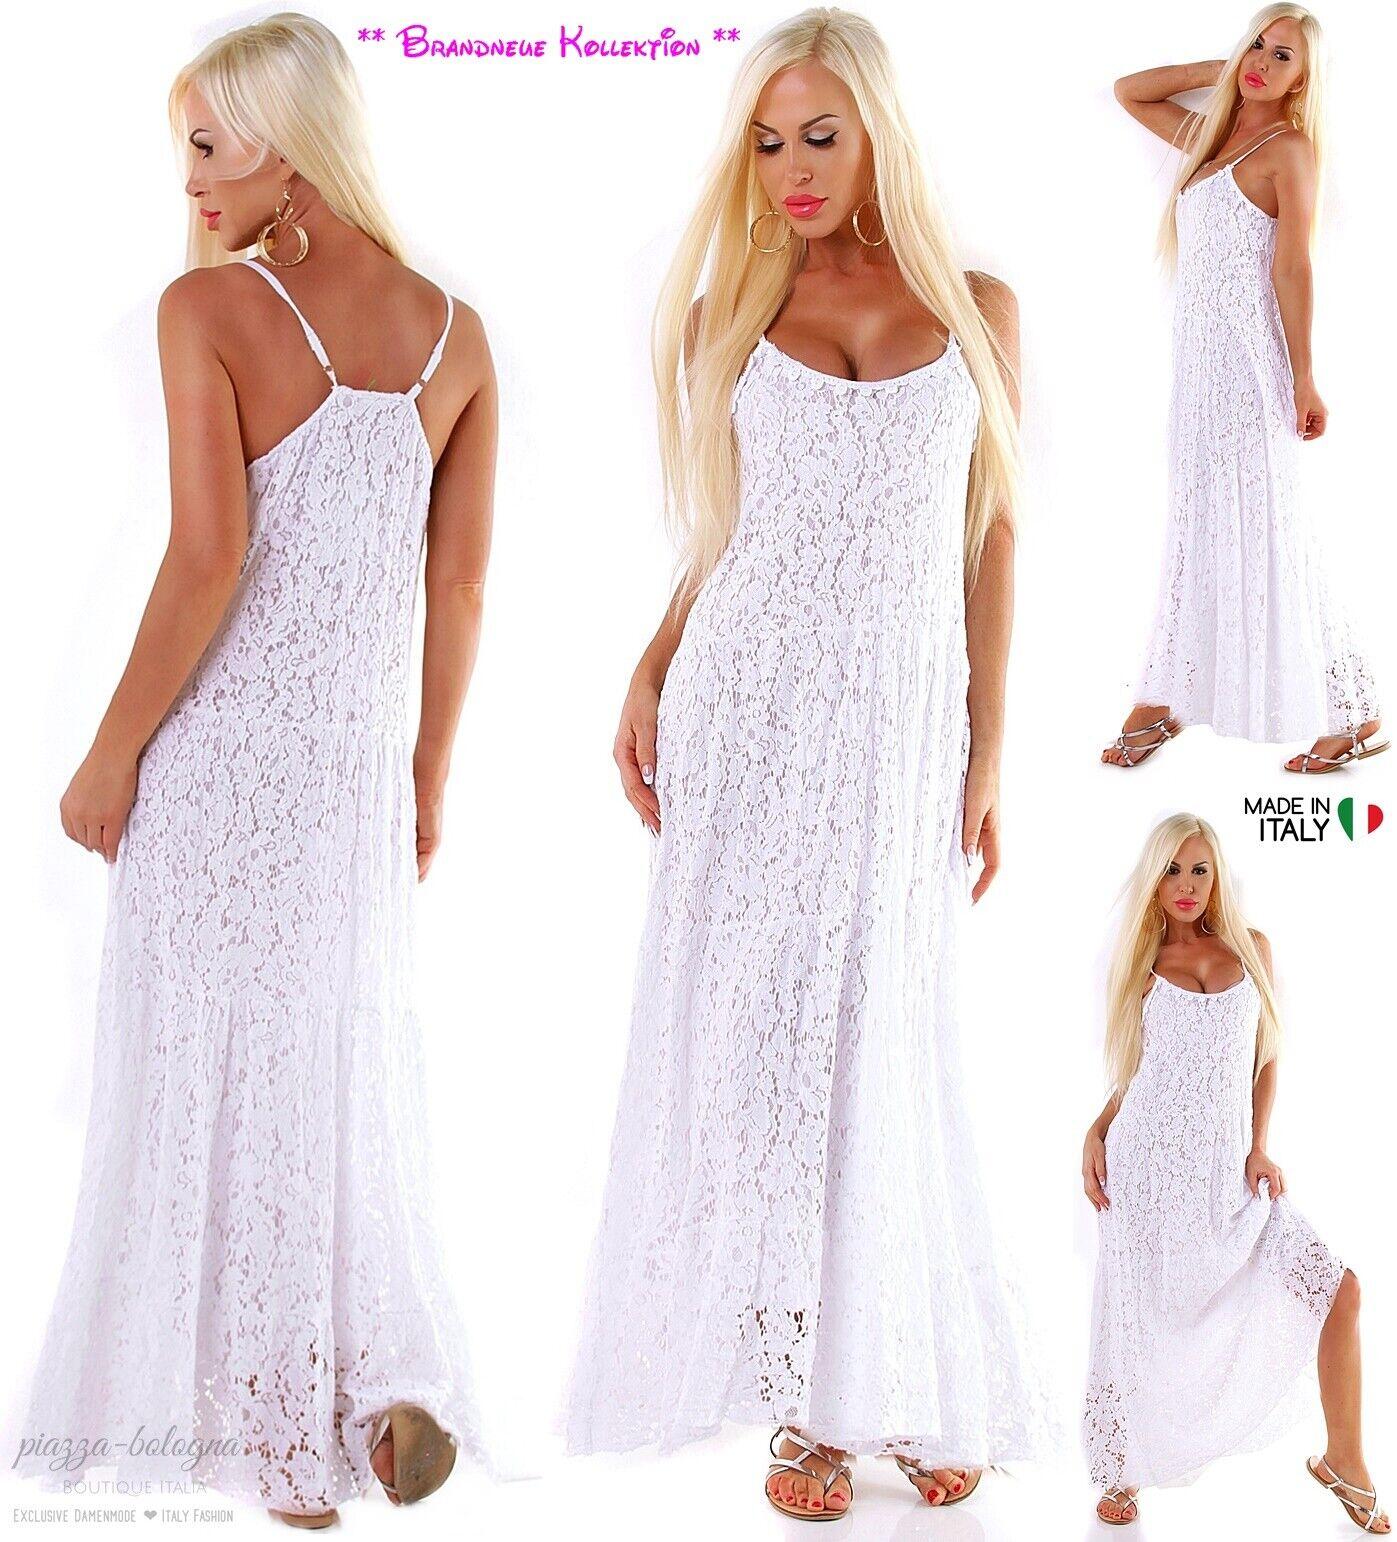 NEU 38 40 Maxikleid 2-lagig komplett aus BlauMänner-Spitze Kleid lang Weiß  M-L